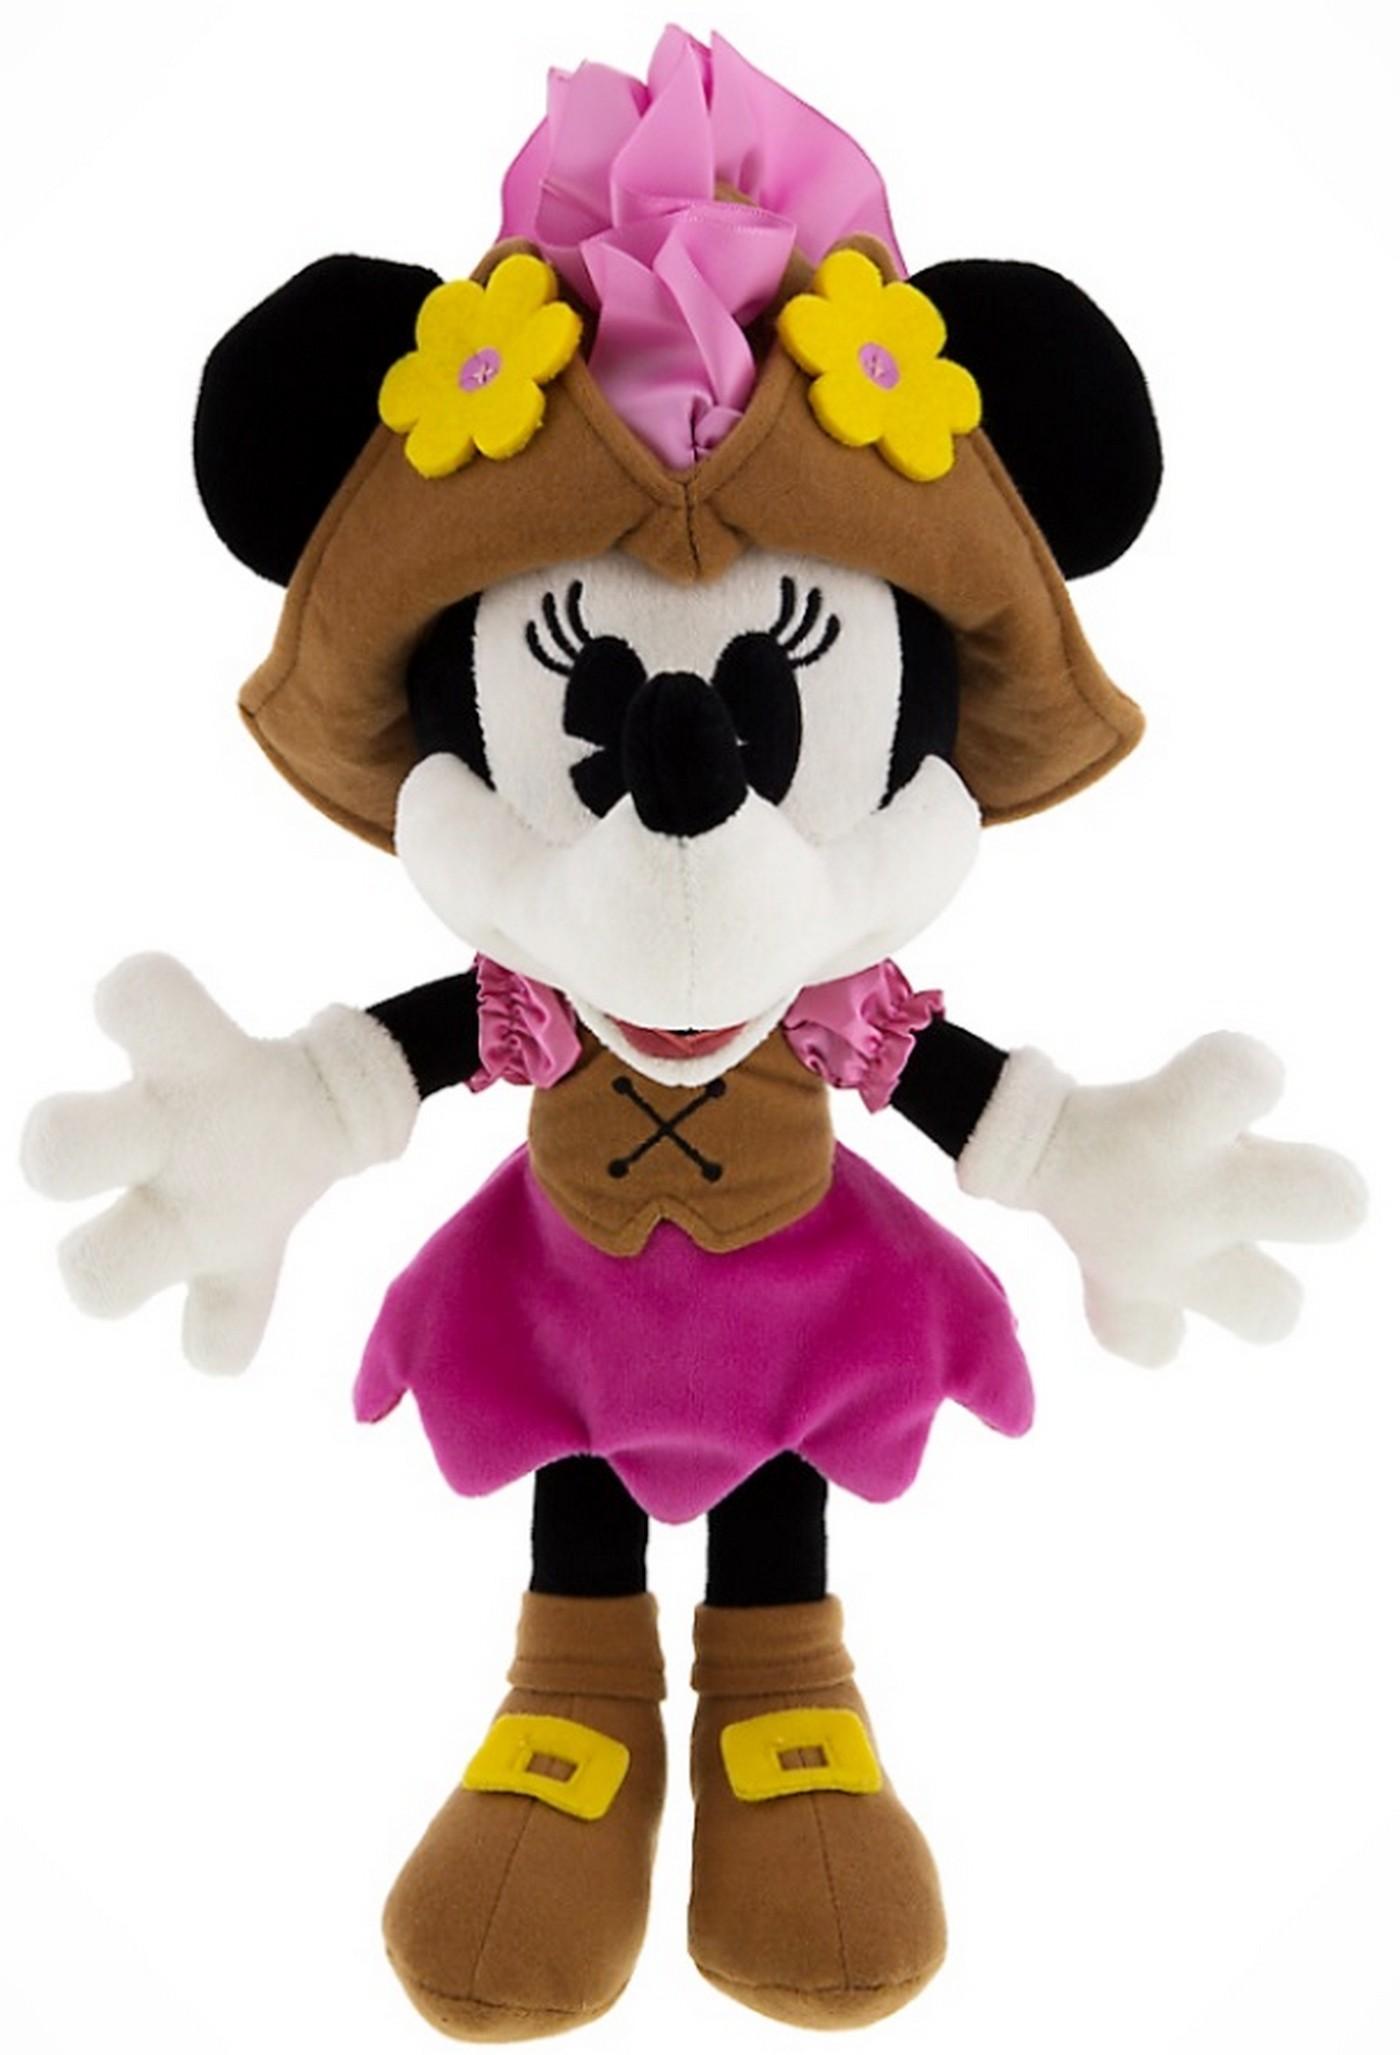 Pirate Minnie Mouse 9 inch (23 cm) Plush ~ Pirates of the Caribbean © Dizdude.com